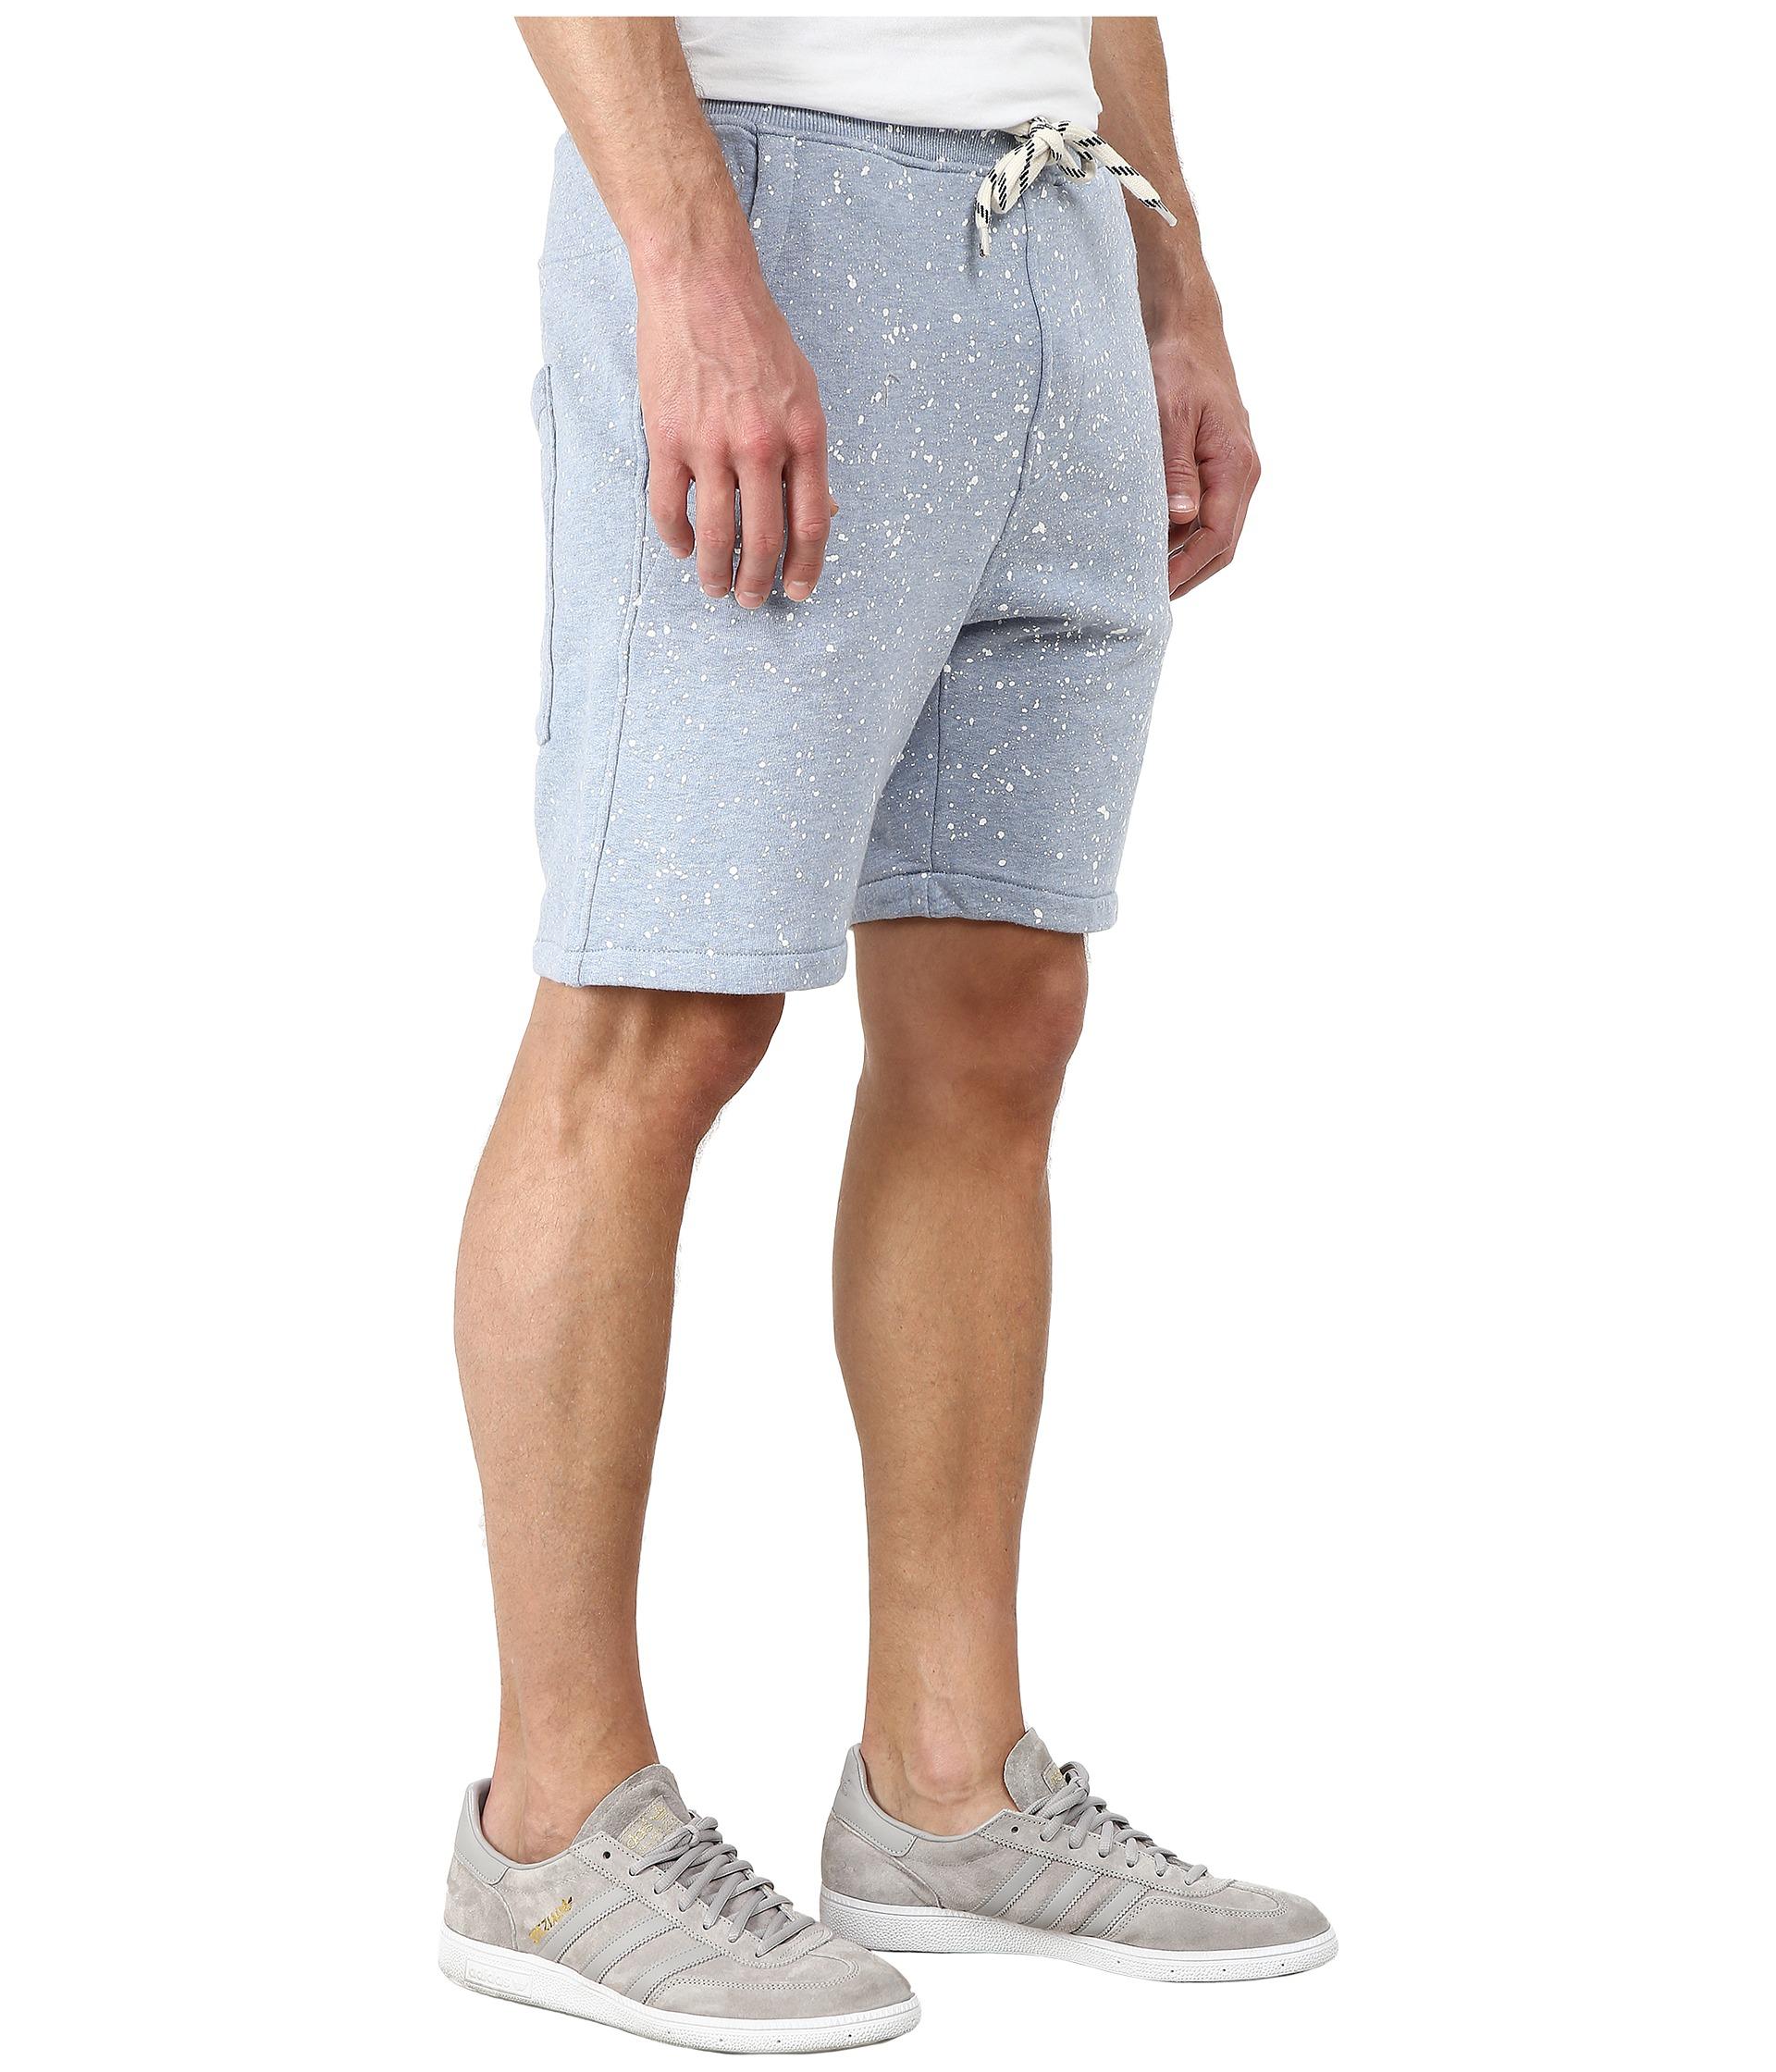 lyst g star raw splatter sweat shorts in blue for men. Black Bedroom Furniture Sets. Home Design Ideas